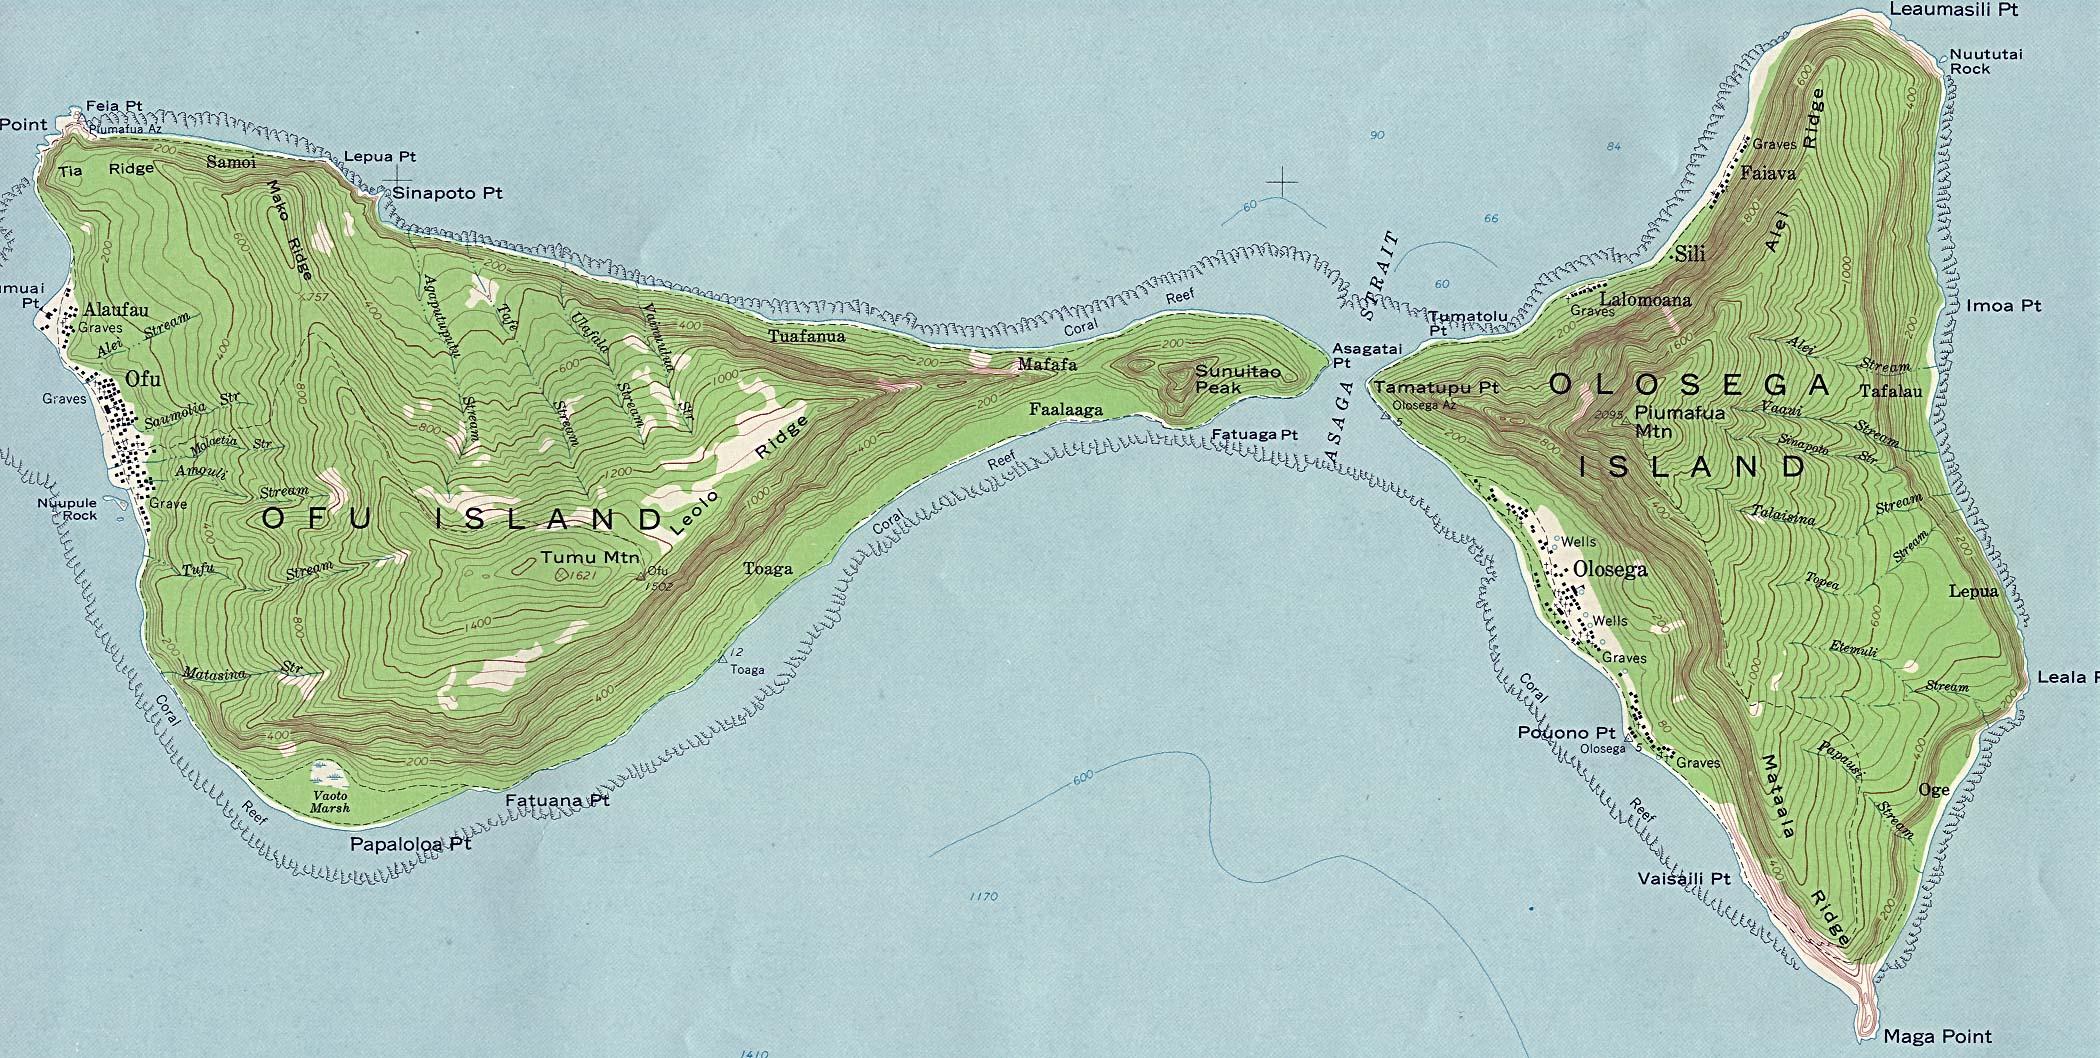 Mapa Topográfico de las Islas Ofu y Olosega, Islas Manu'a, Samoa Americana